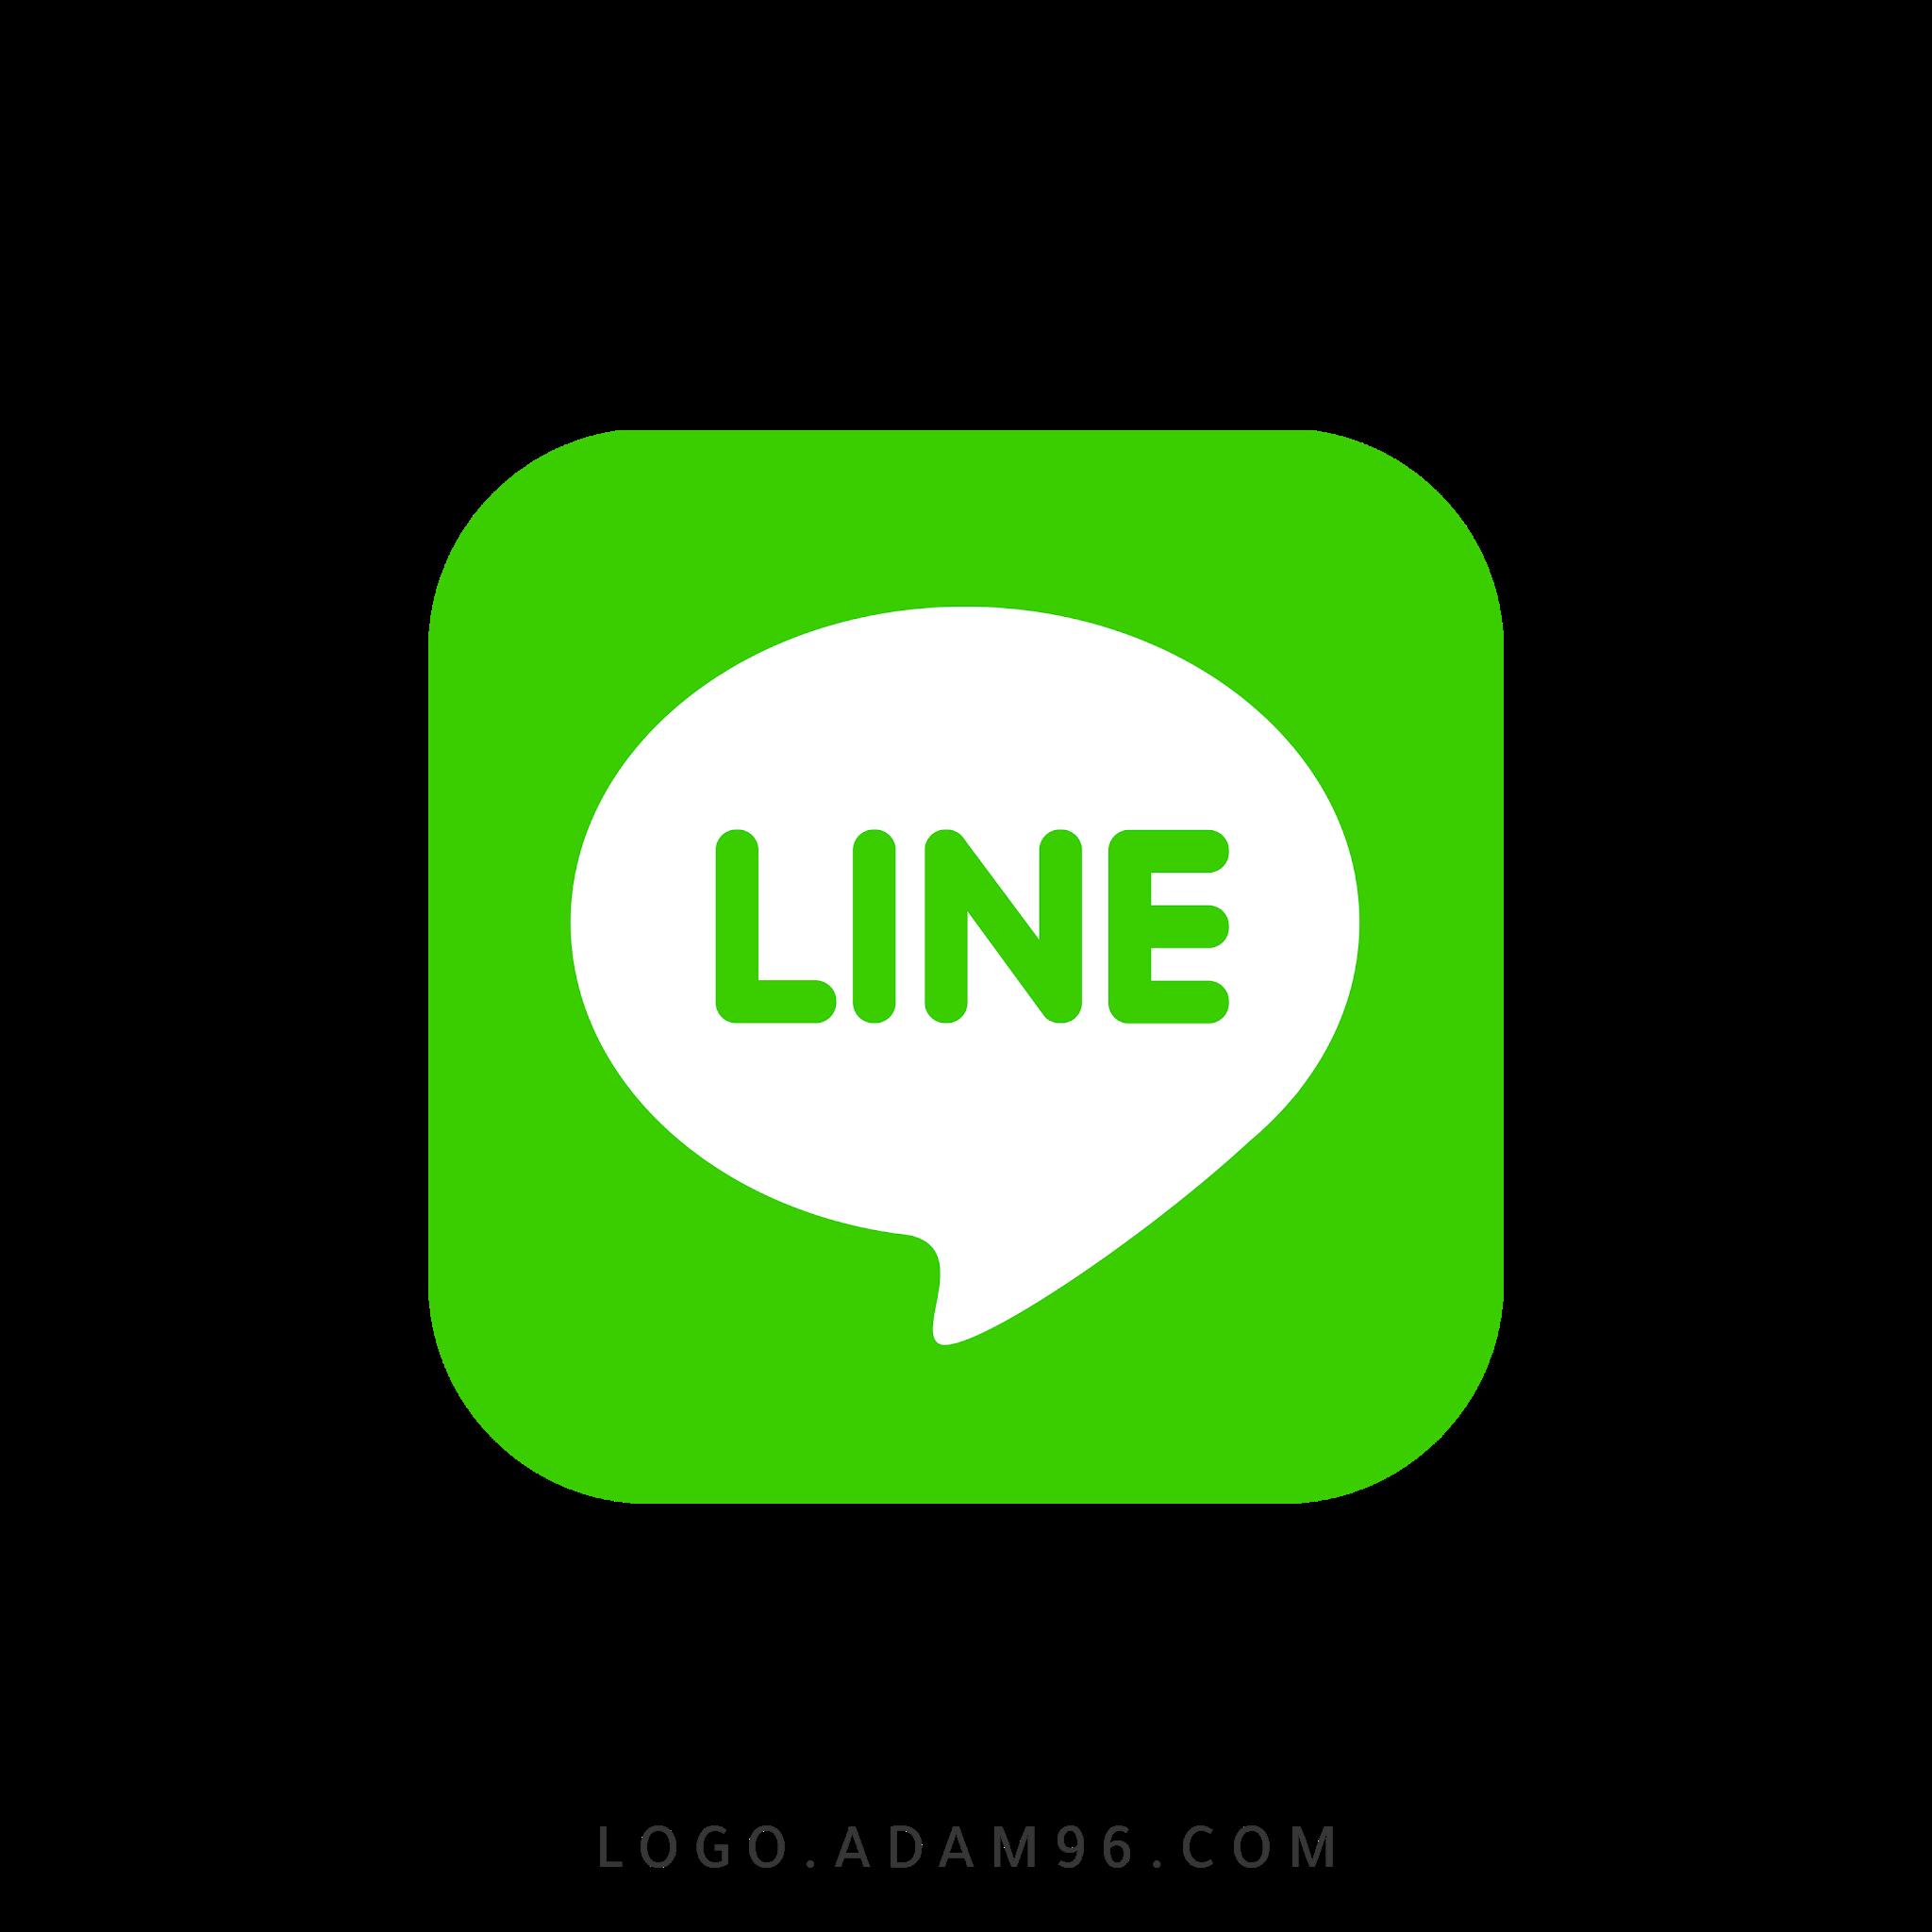 تحميل شعار تطبيق لاين ماسنجر الشهير لوجو شفاف Logo Line Messenger PNG